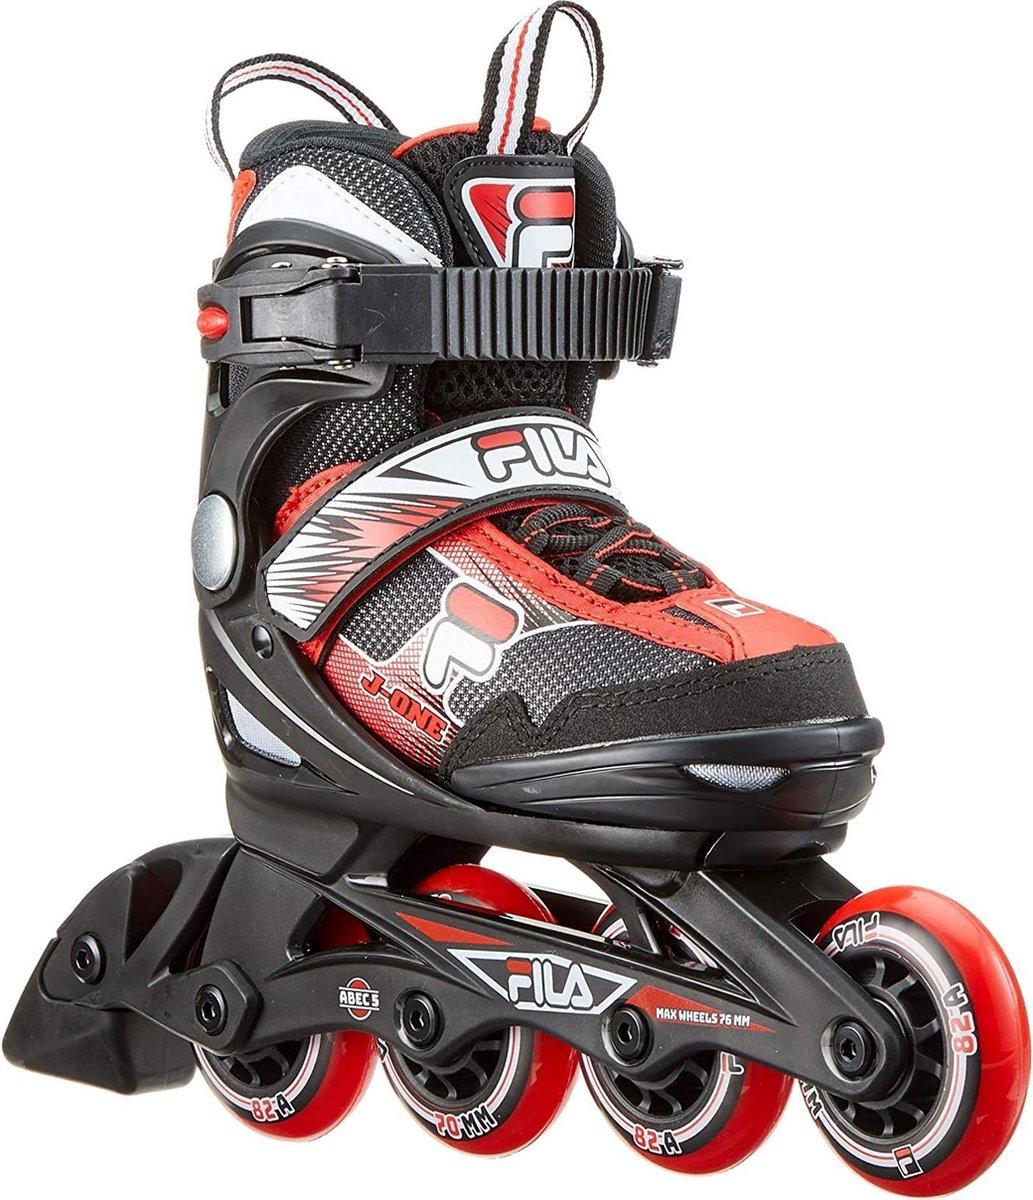 Fila Inlineskates - Maat 36-40 - Unisex - Zwart/ rood/ wit